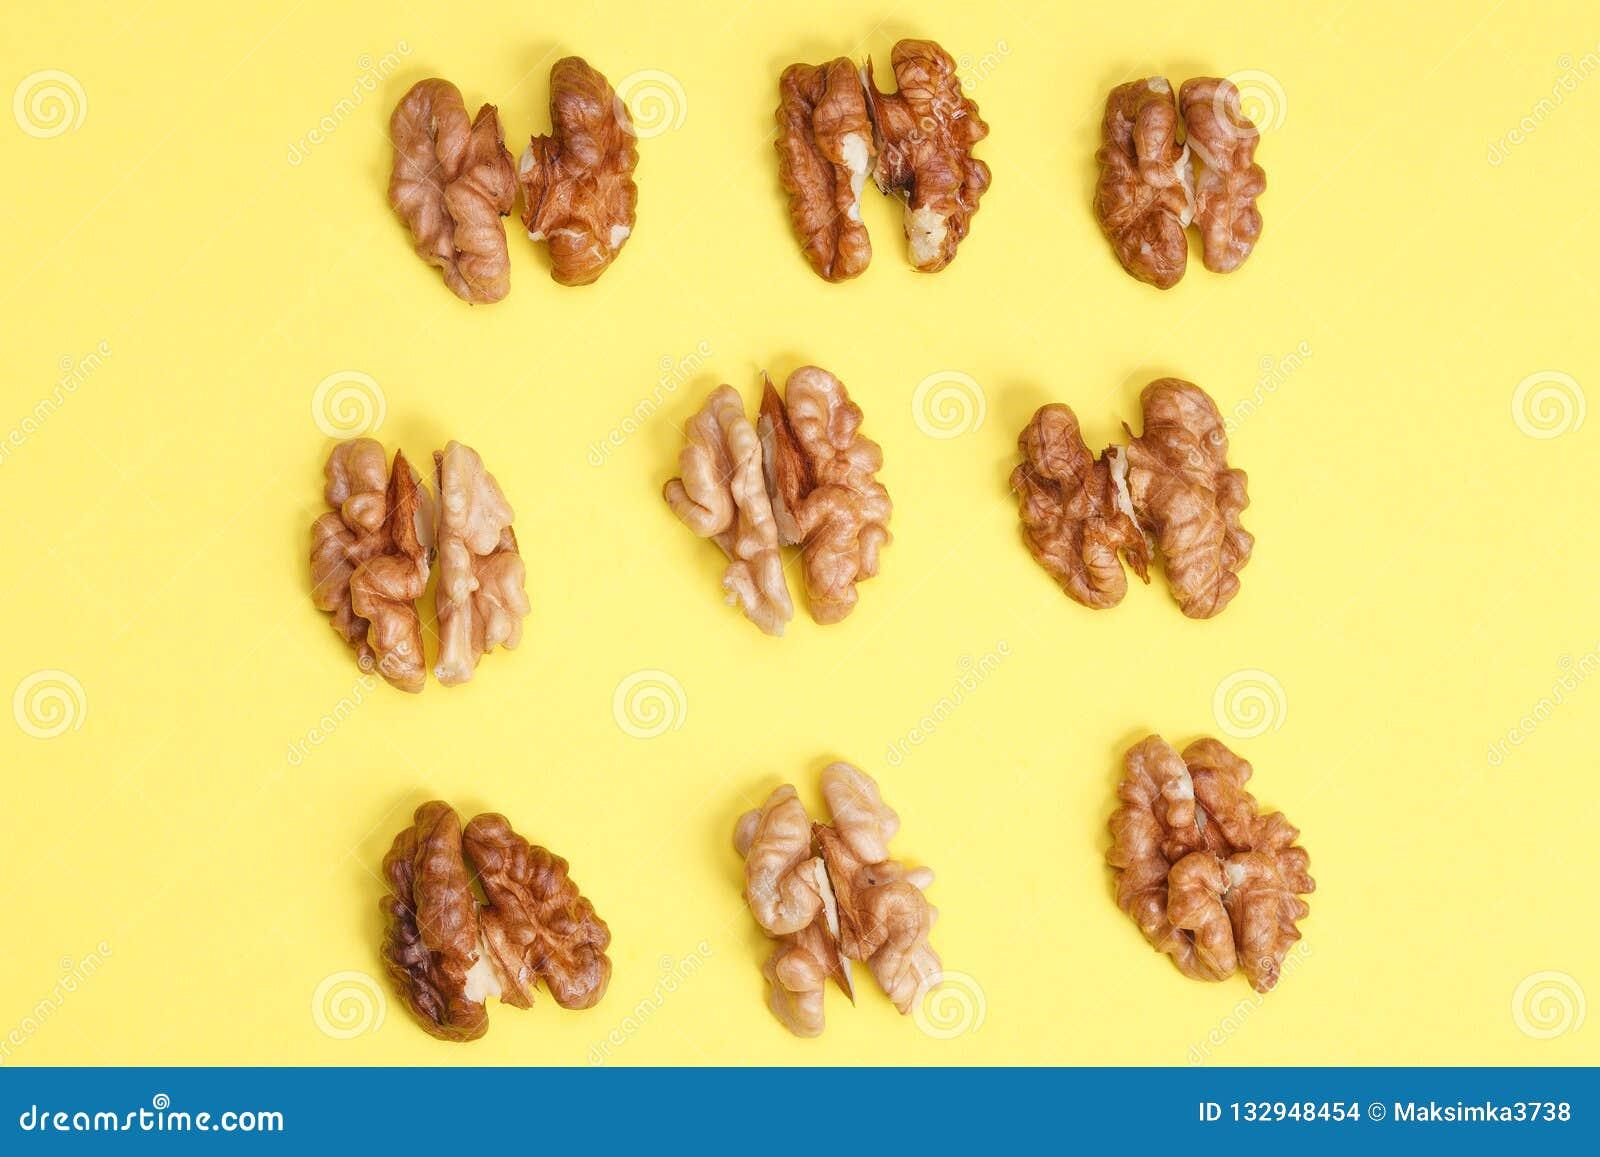 group of halves of walnut.